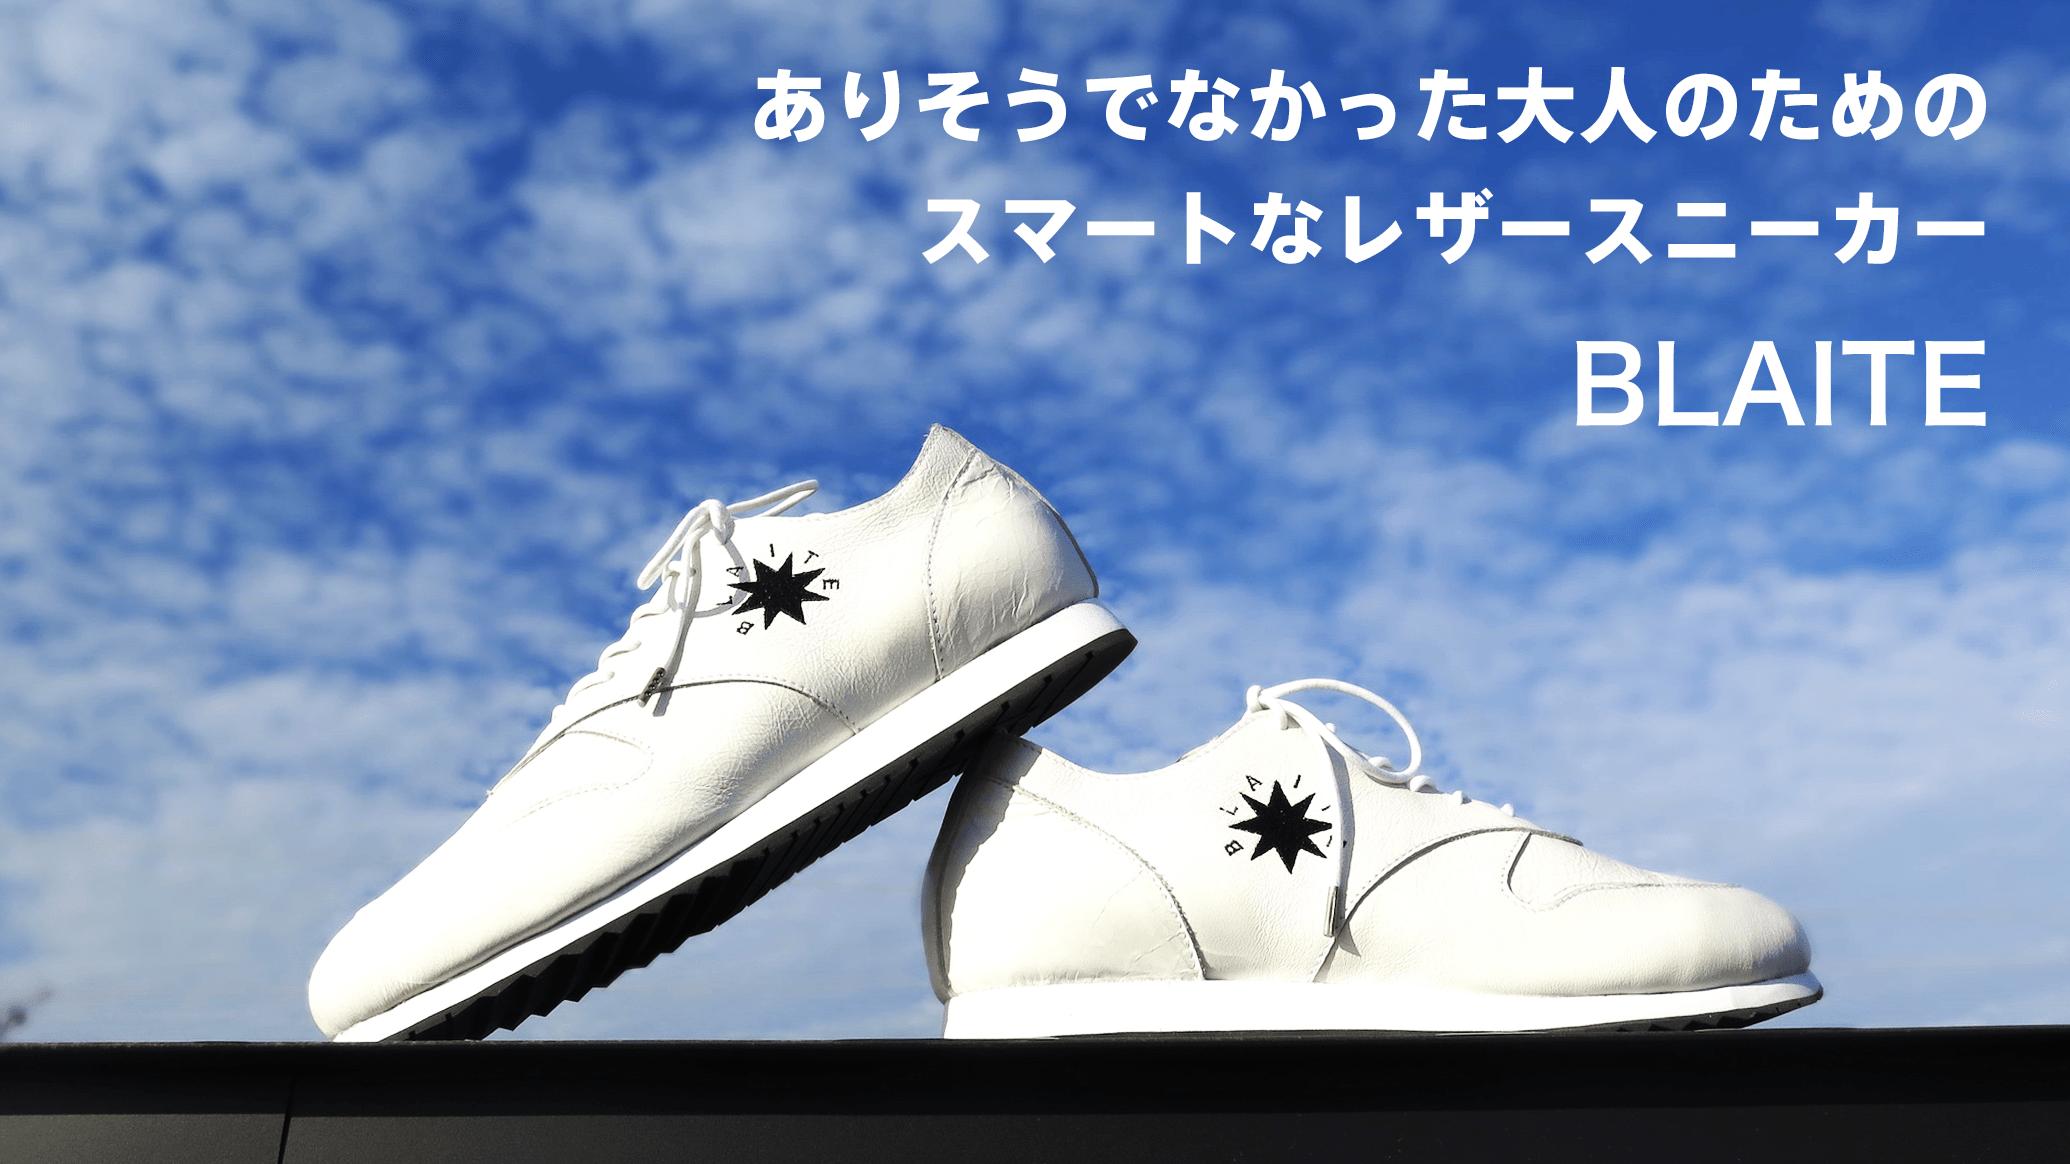 Makuake|『考えずに履ける』大人のレザースニーカー。日本の新しいスニーカーブランドへの挑戦